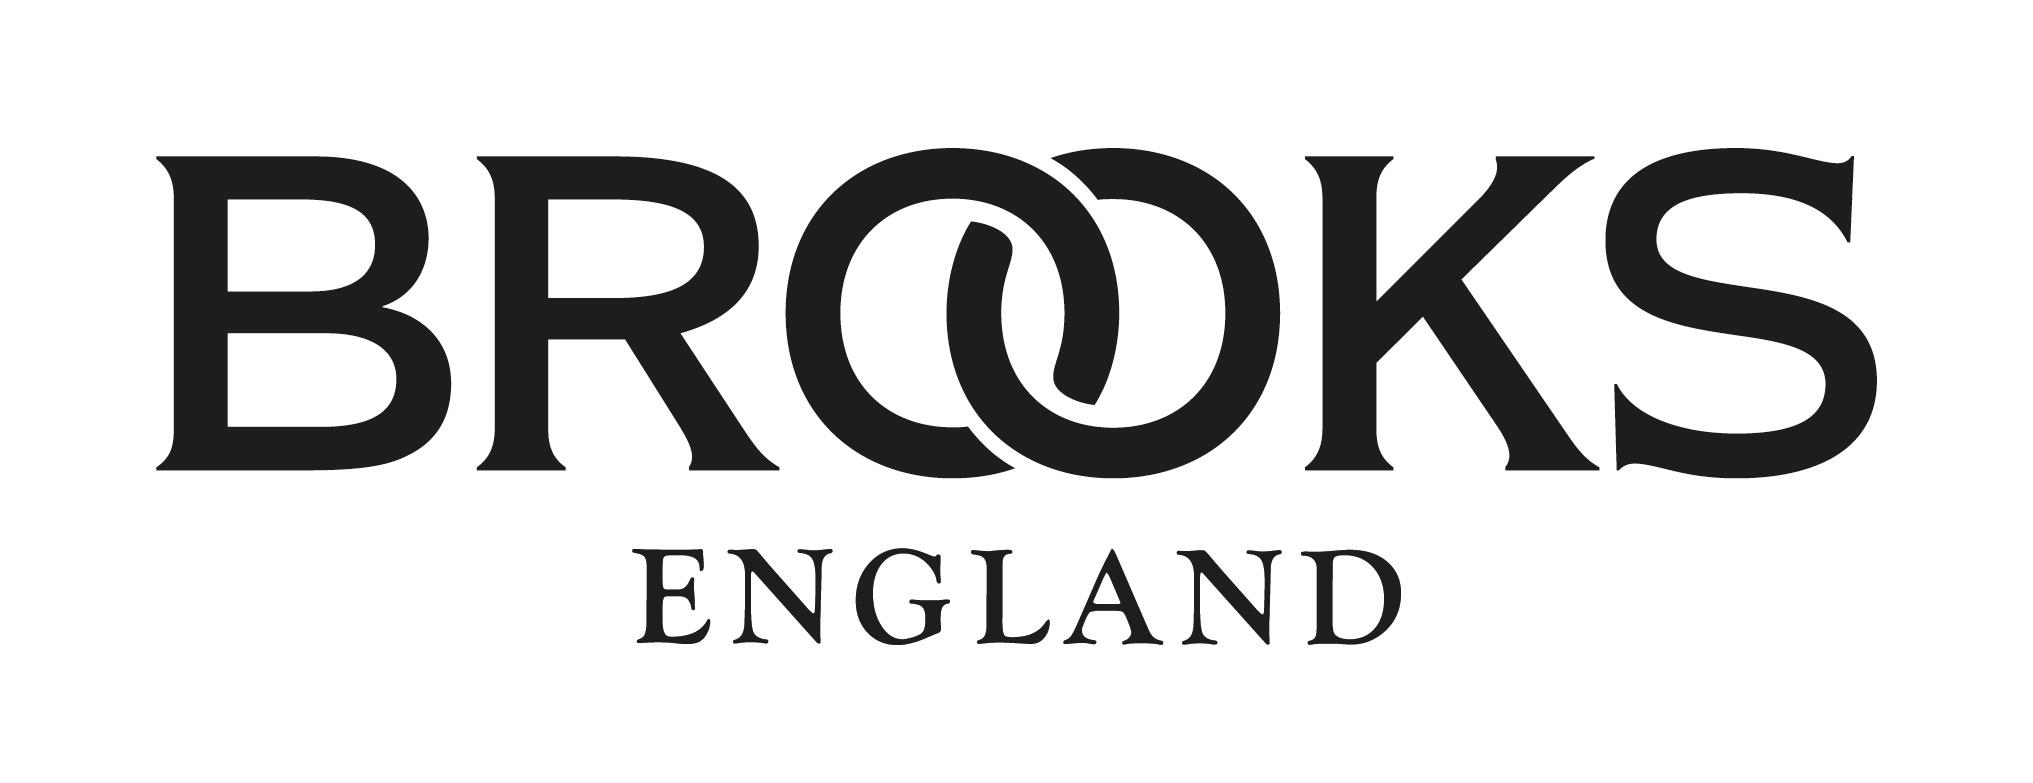 Brooks England